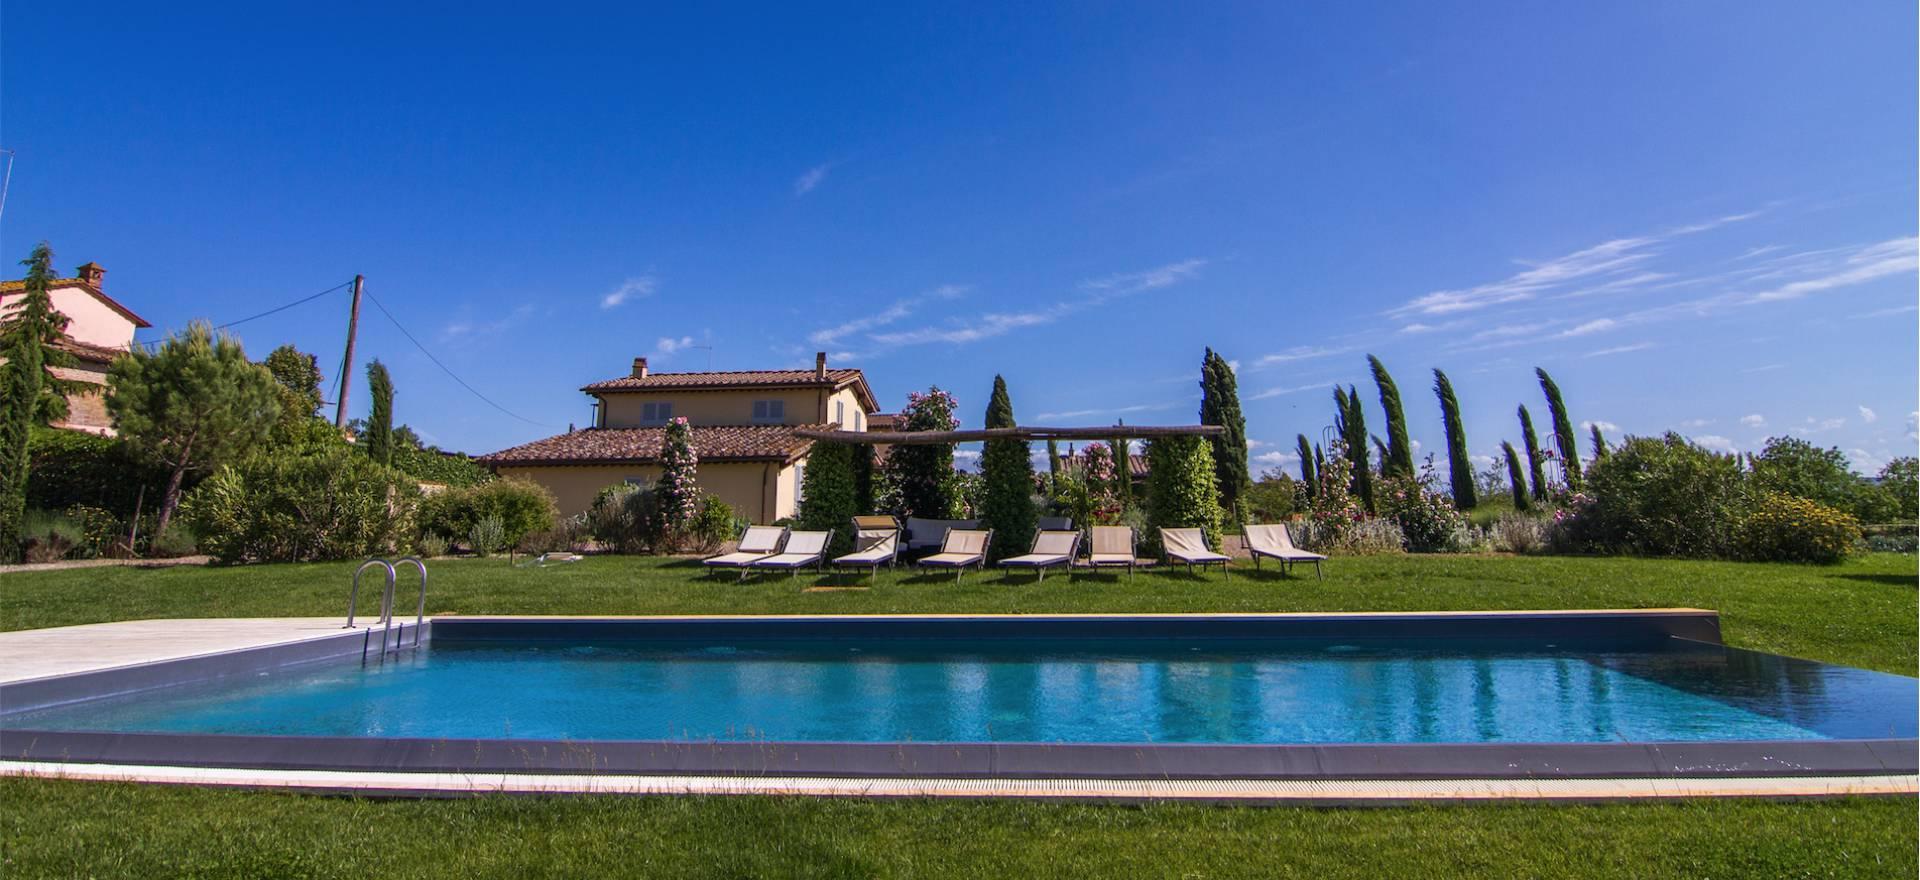 Agriturismo Toscane Agriturismo Siena, familie appartementen en zwembad